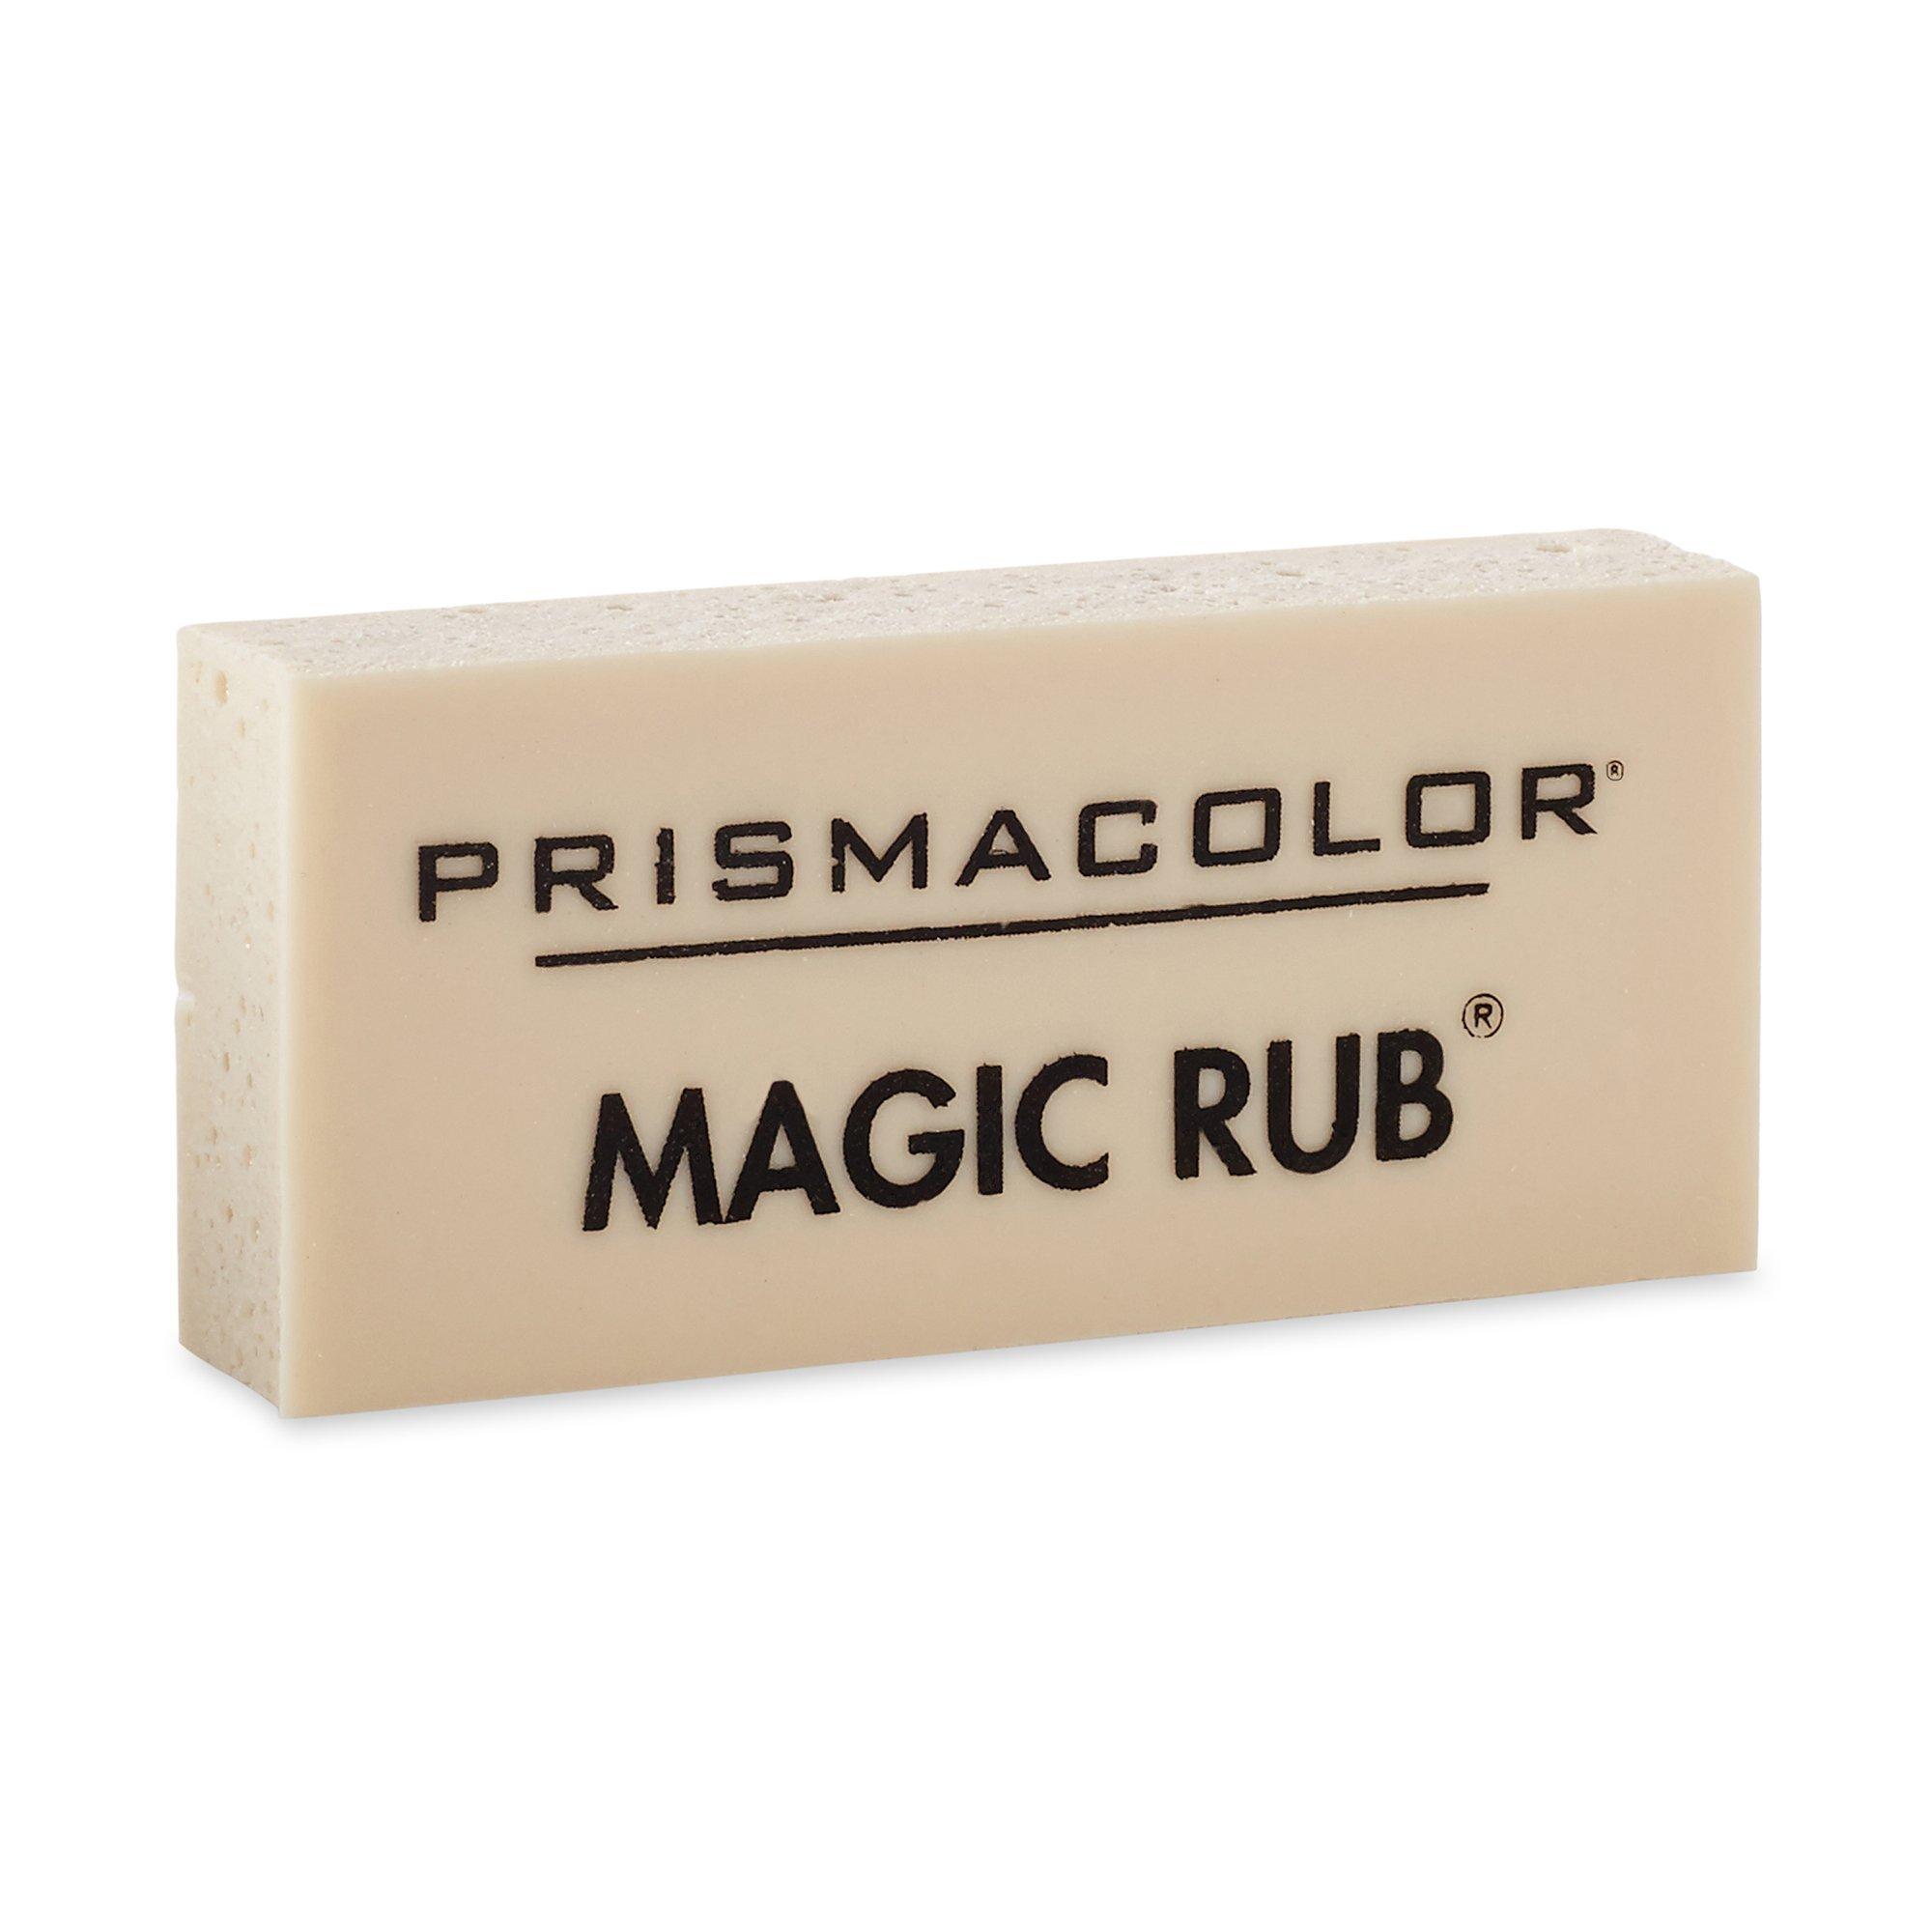 Prismacolor Premier Magic Rub Vinyl Erasers, 3-Count by Prismacolor (Image #1)